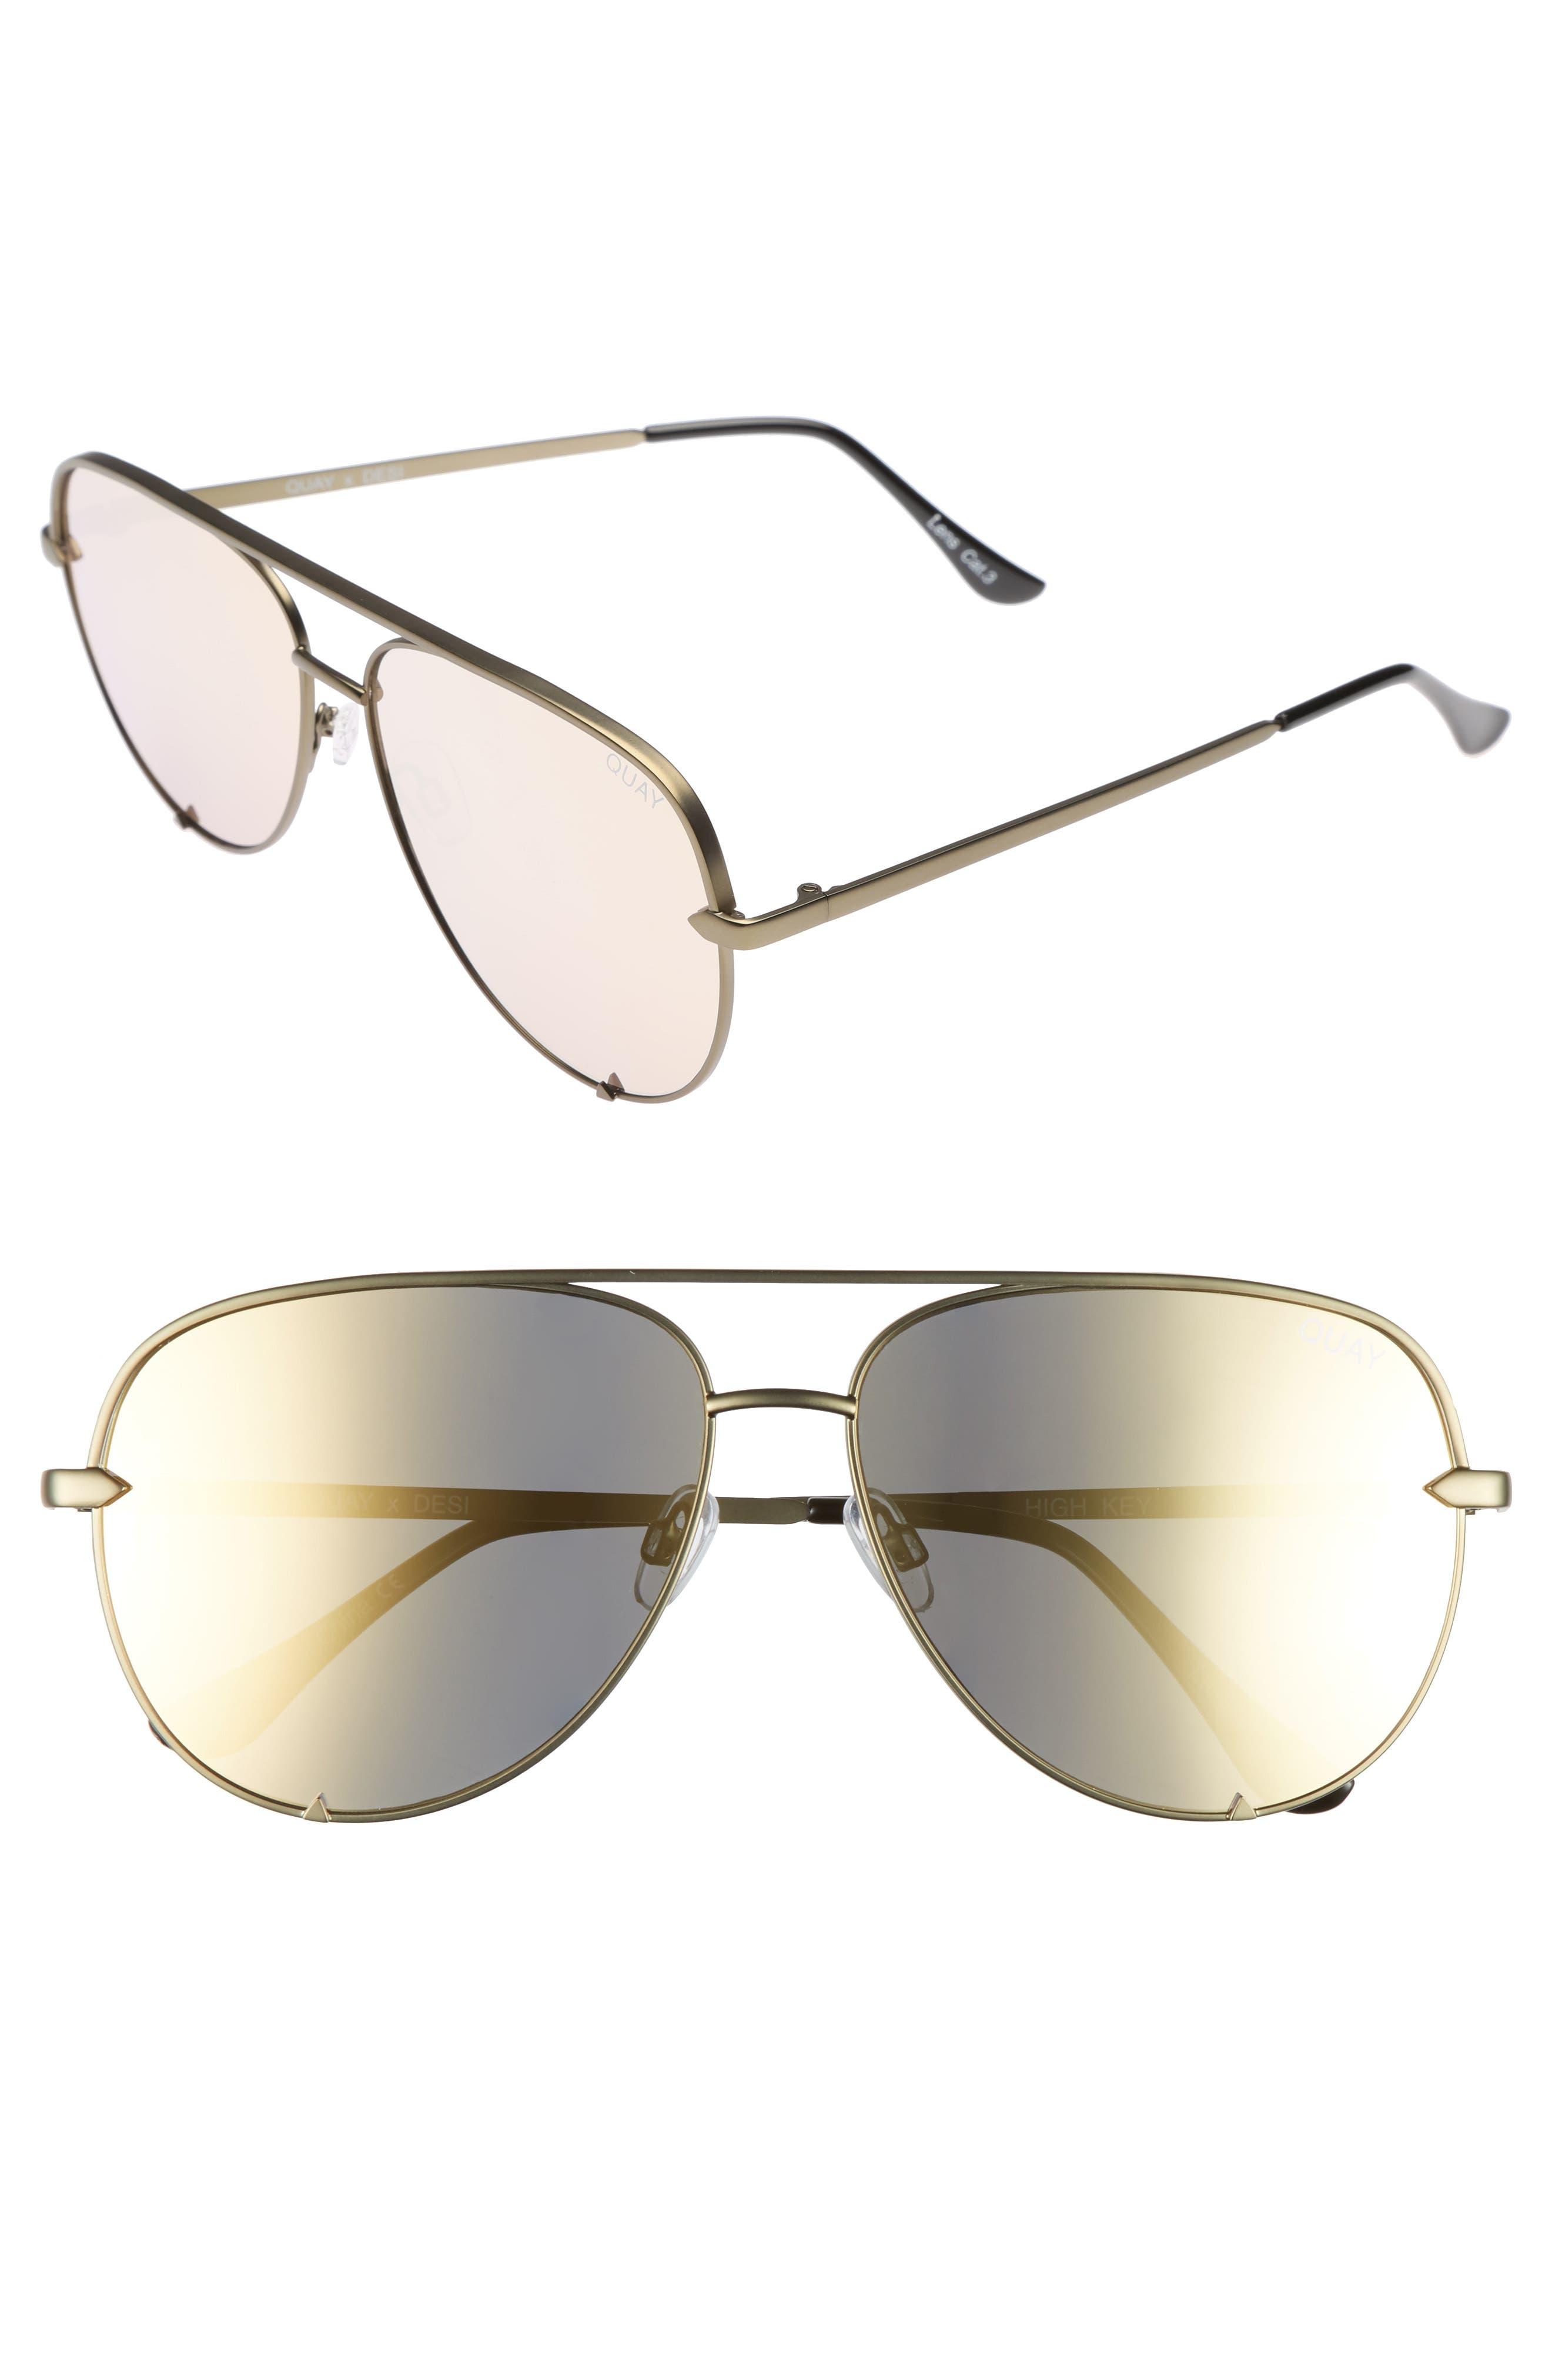 x Desi Perkins High Key 60mm Aviator Sunglasses,                             Main thumbnail 1, color,                             Green/ Gold